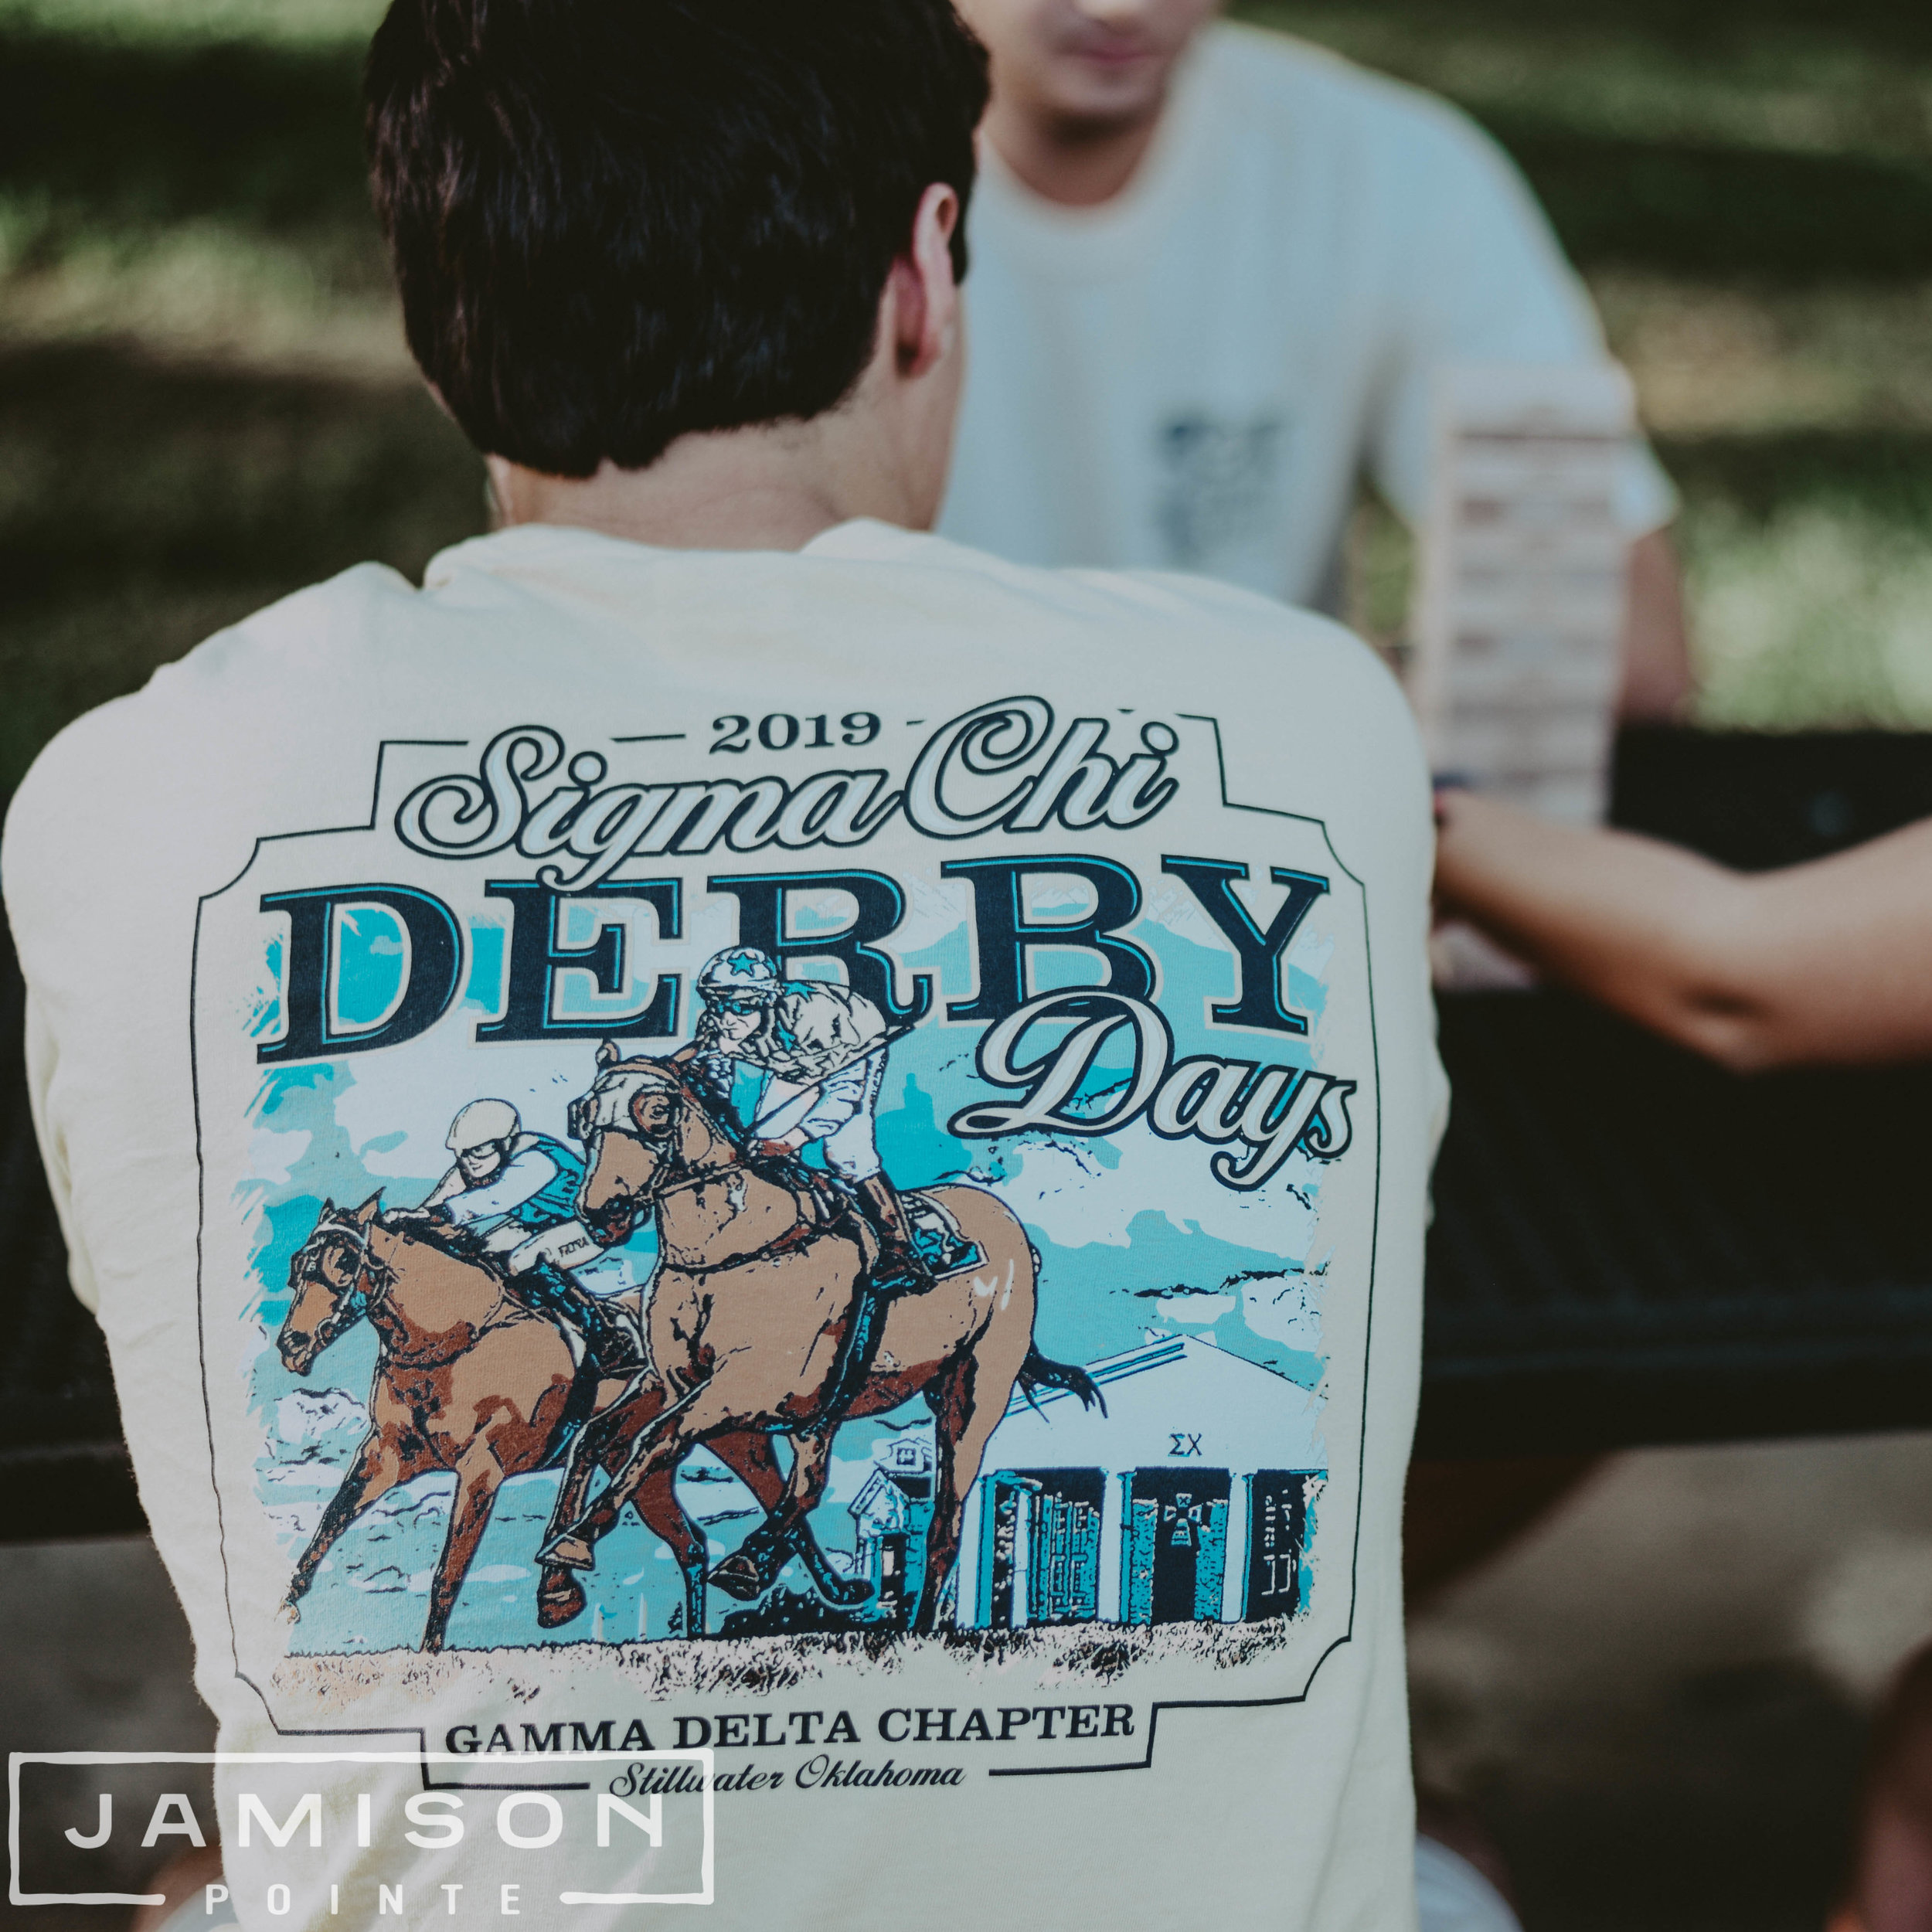 Sigma Chi Derby Days T-shirt